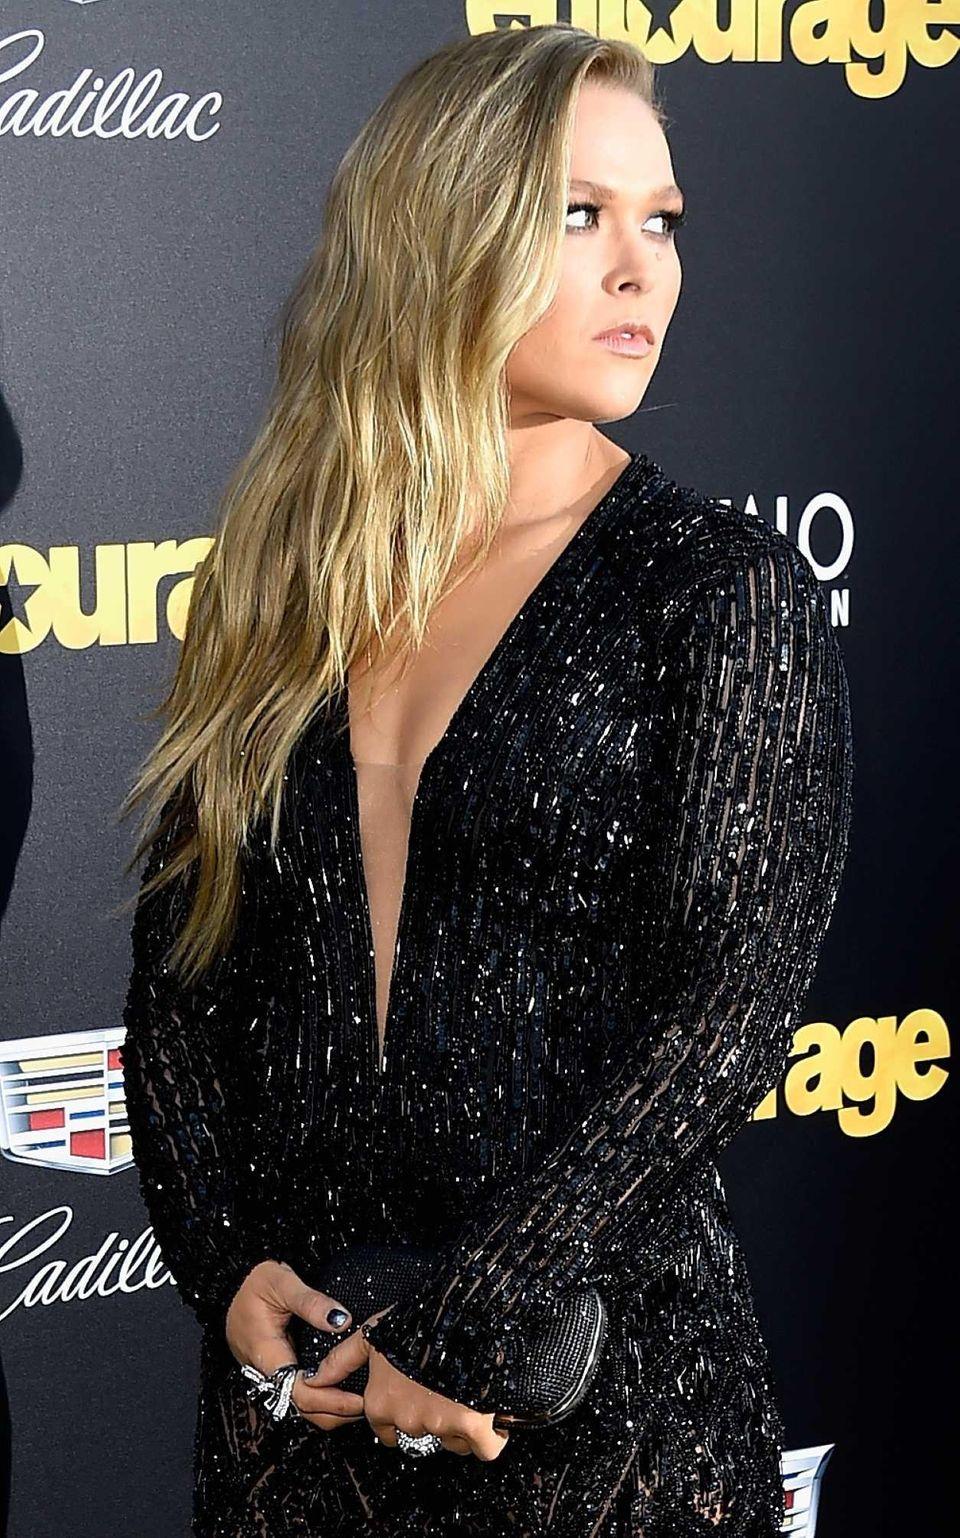 WESTWOOD, CA - JUNE 01: Actress Ronda Rousey